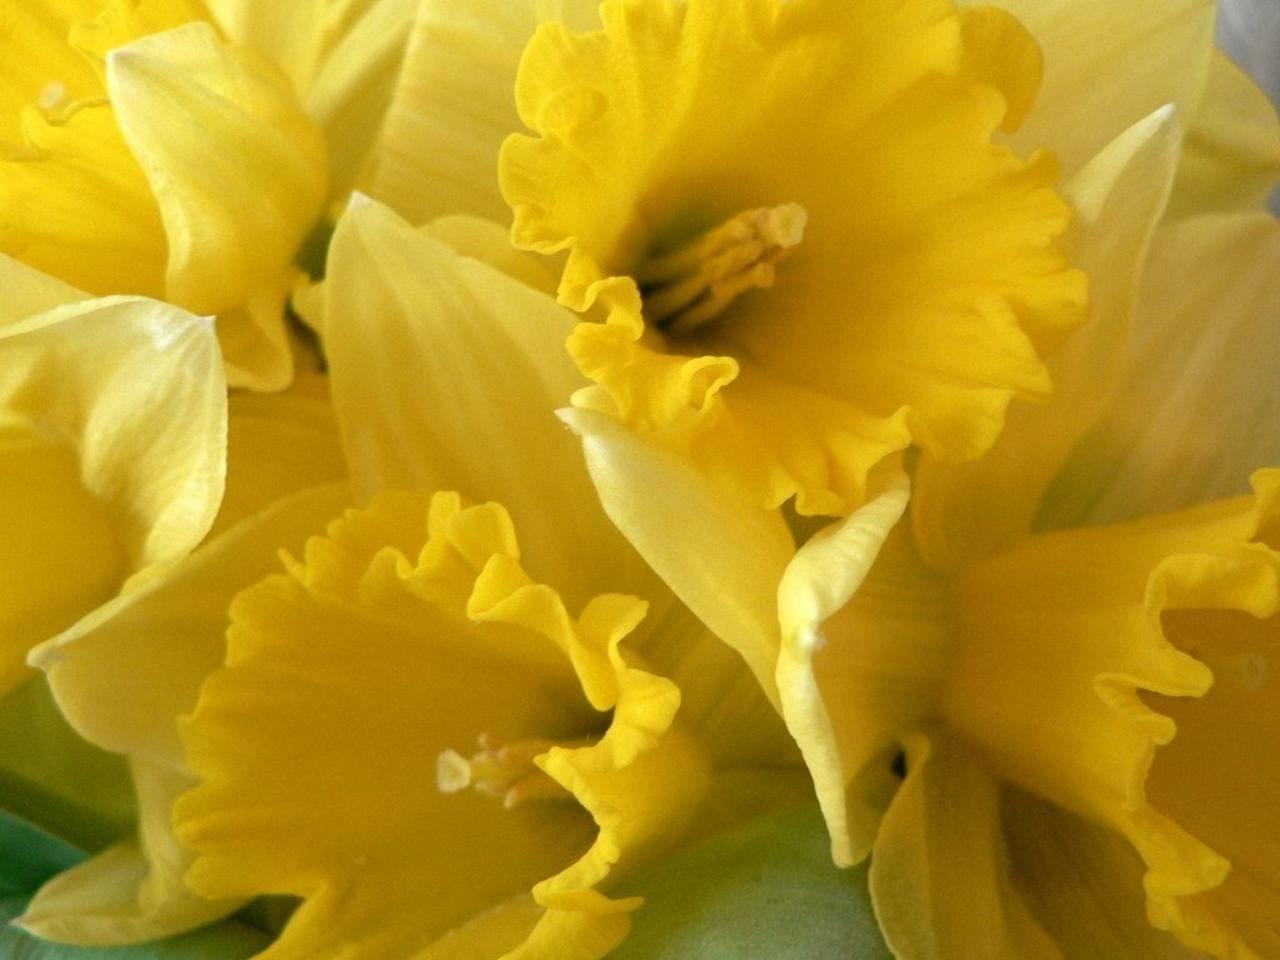 Description daffodils yellow